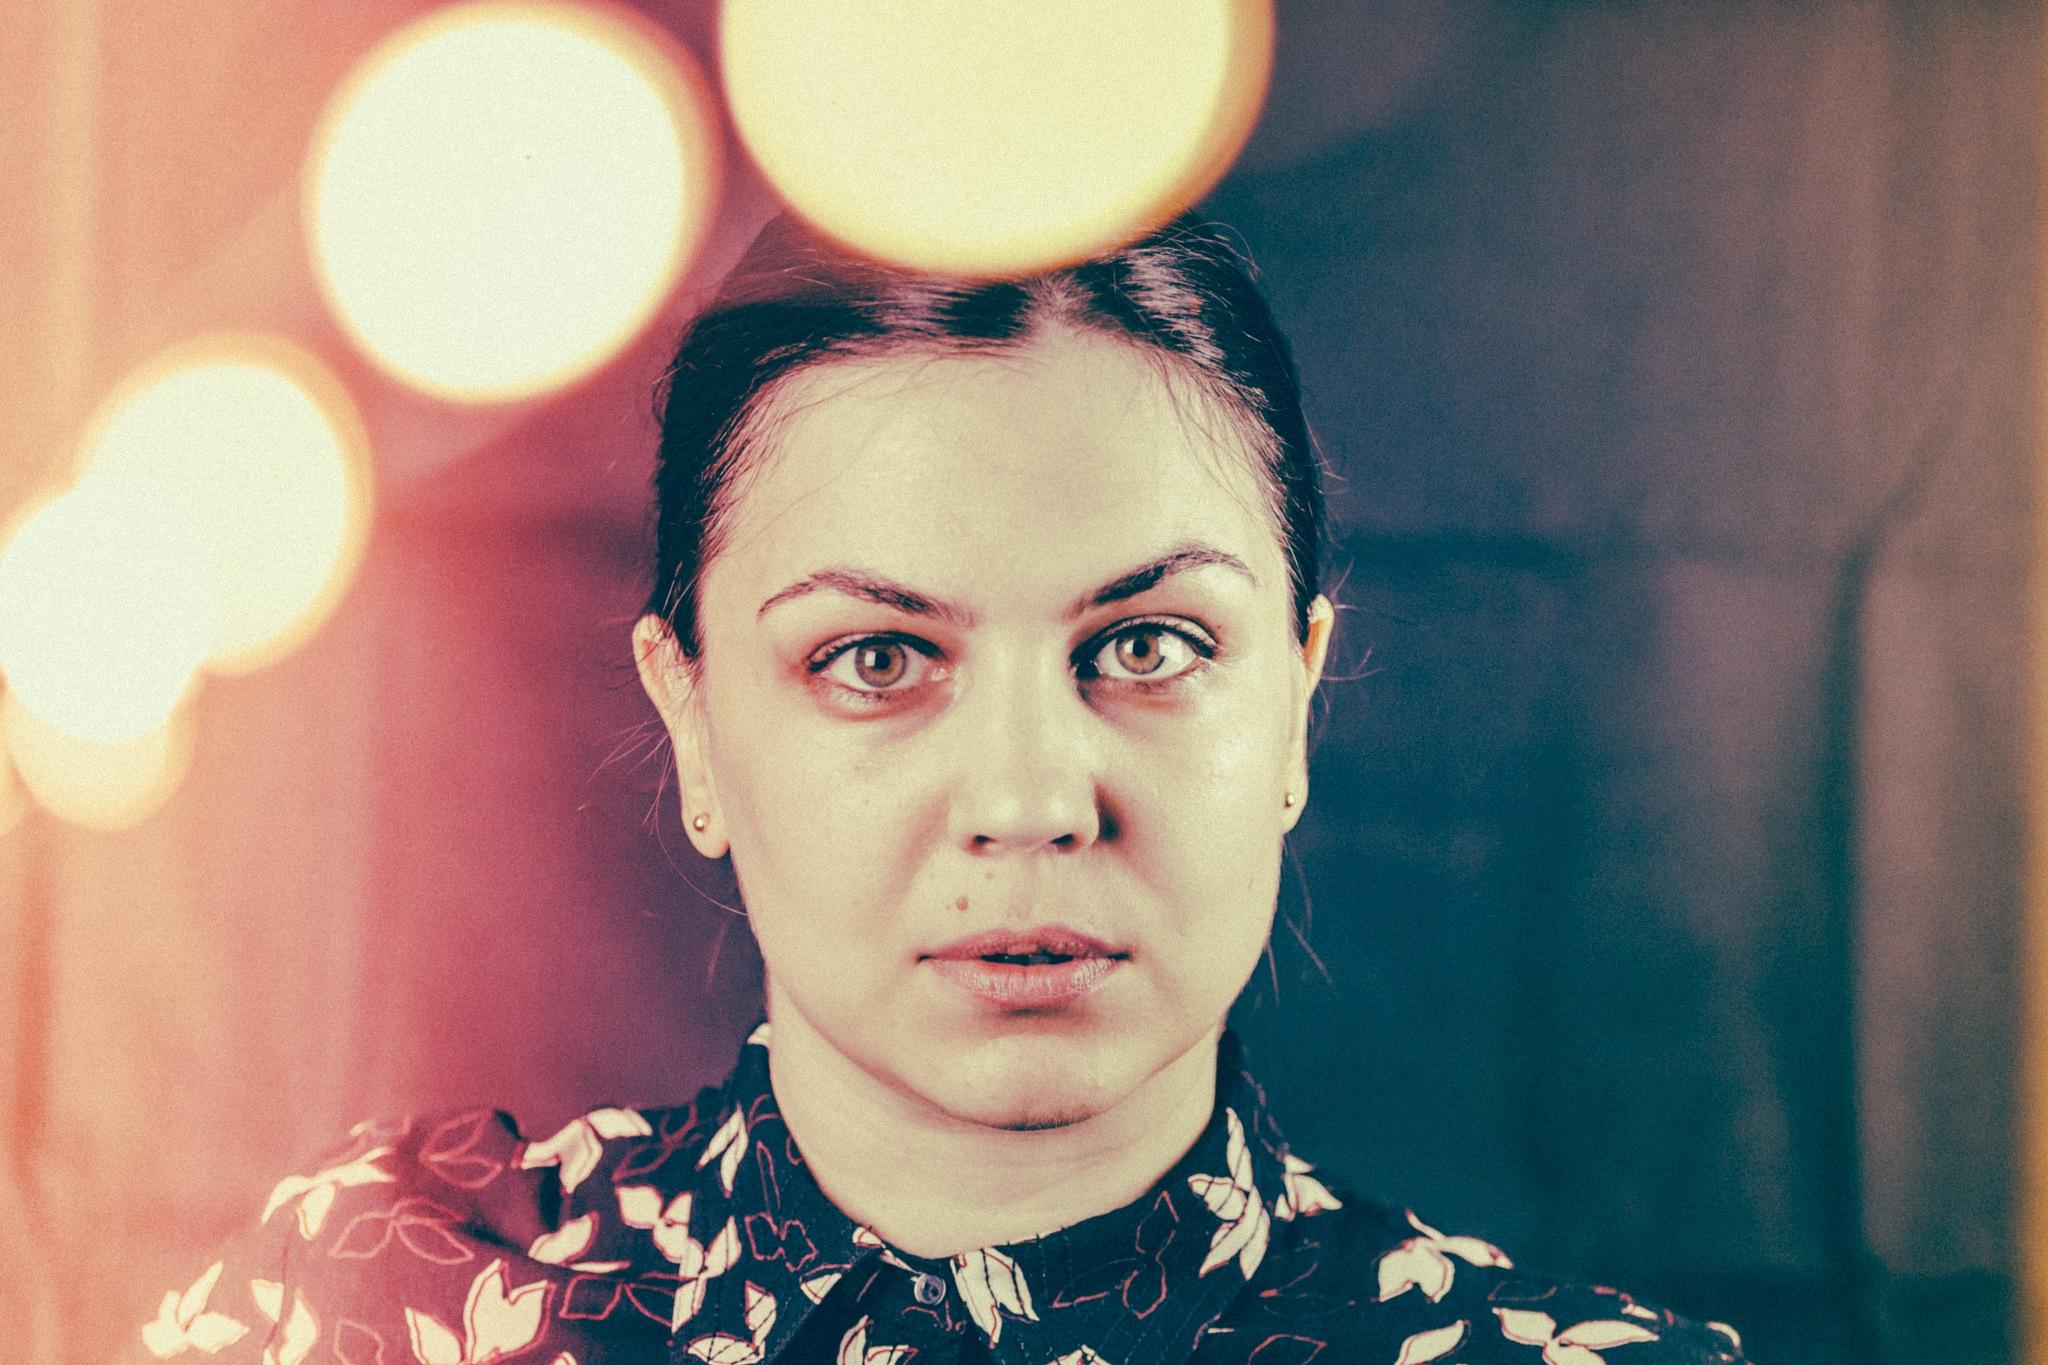 Self Portrait - Rose Period. by Iri Kirova